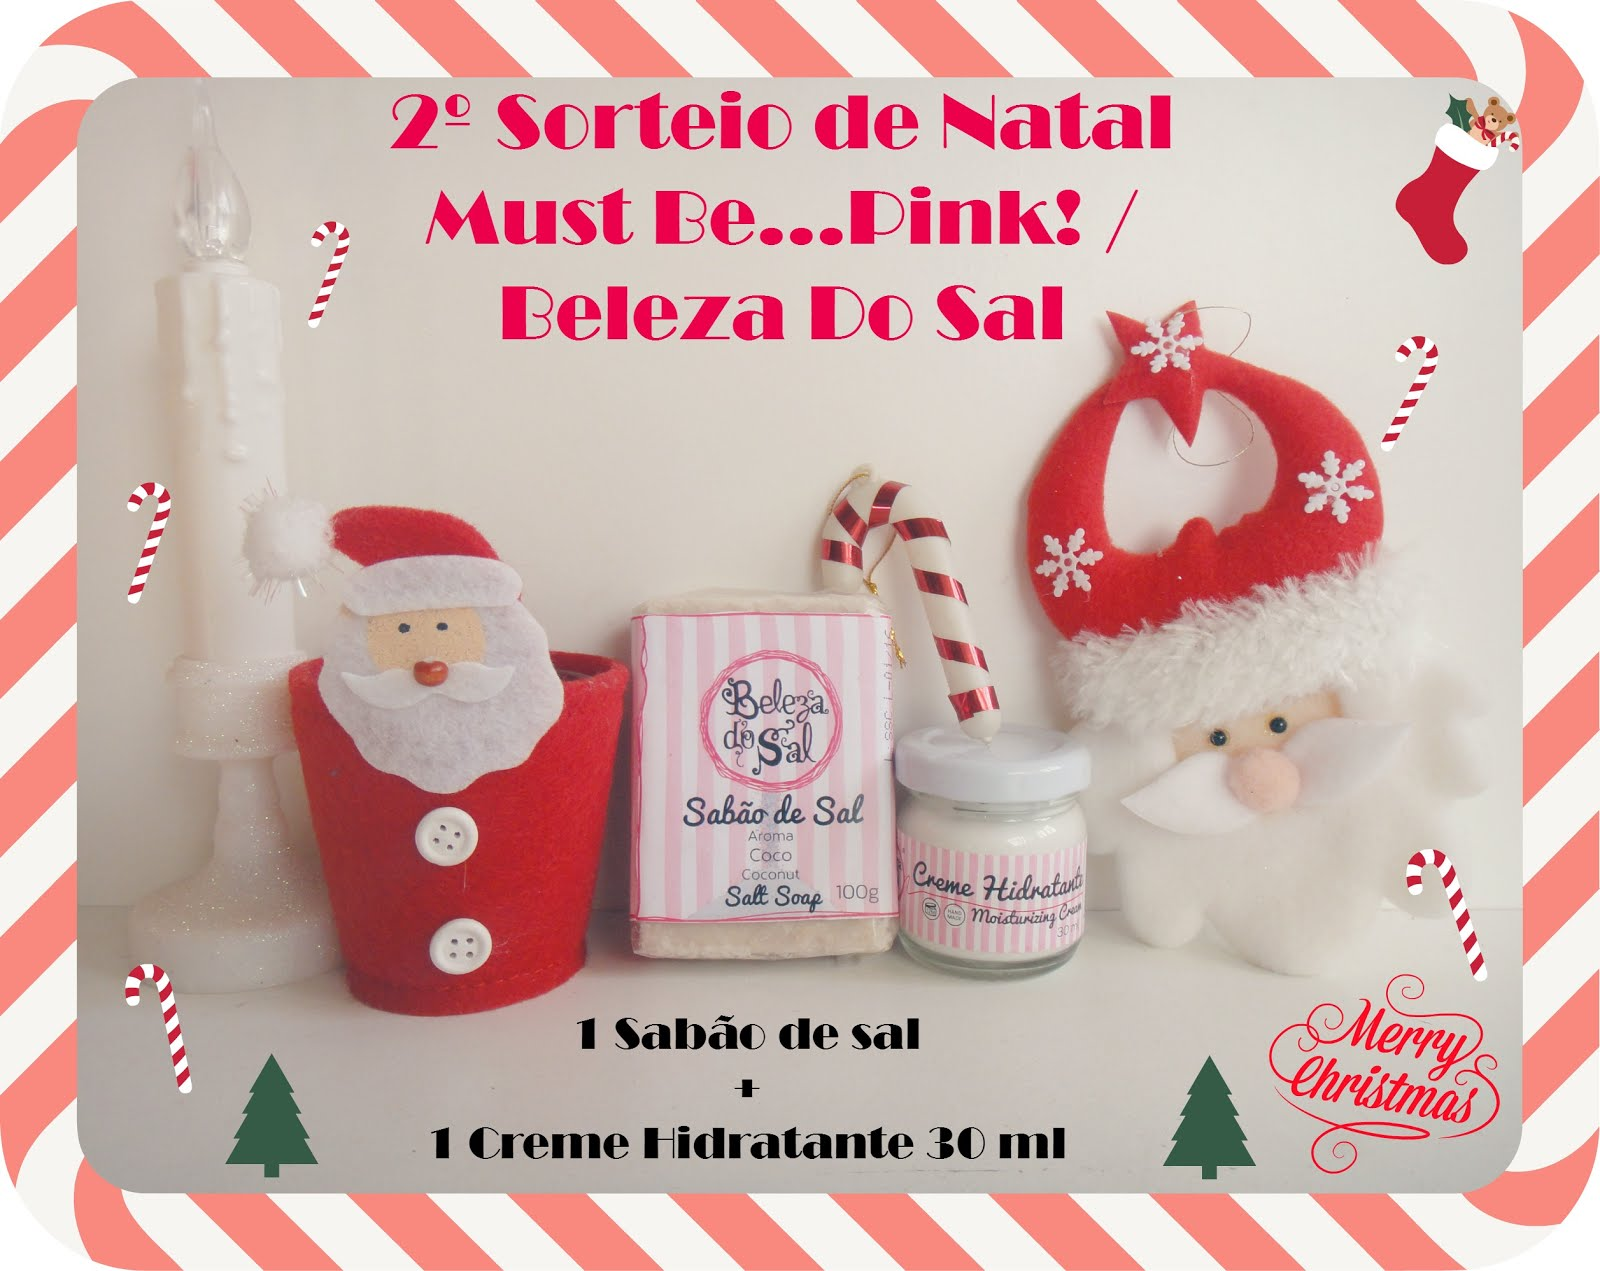 2º Sorteio de Natal - Beleza do Sal